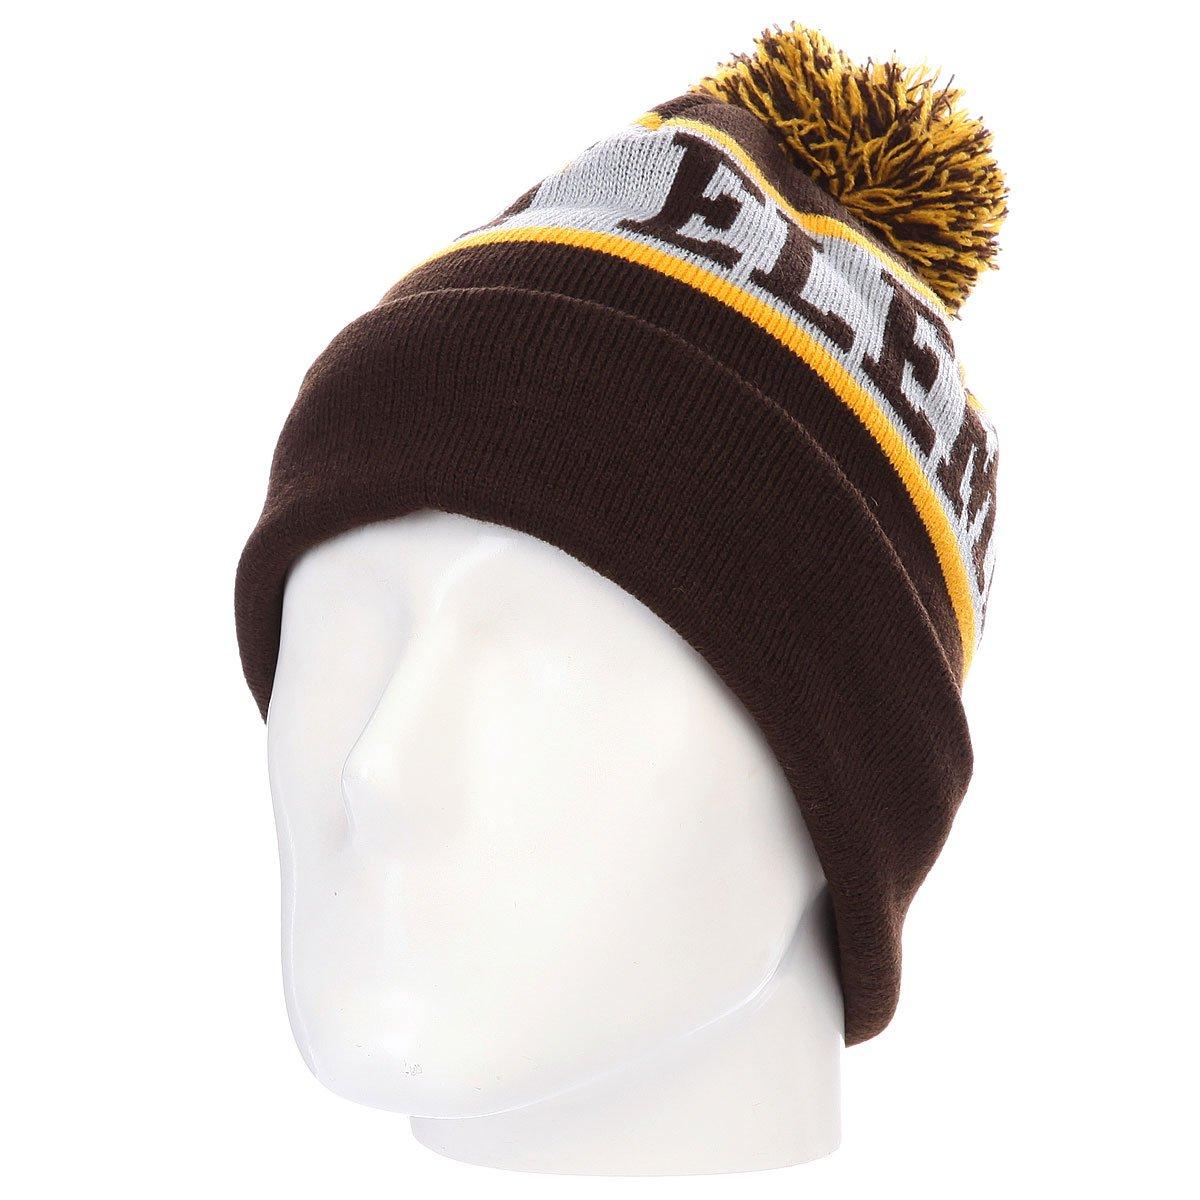 351d2b5dabb Купить шапку с помпоном Element Fairfax Beanie Dark Brown в интернет ...